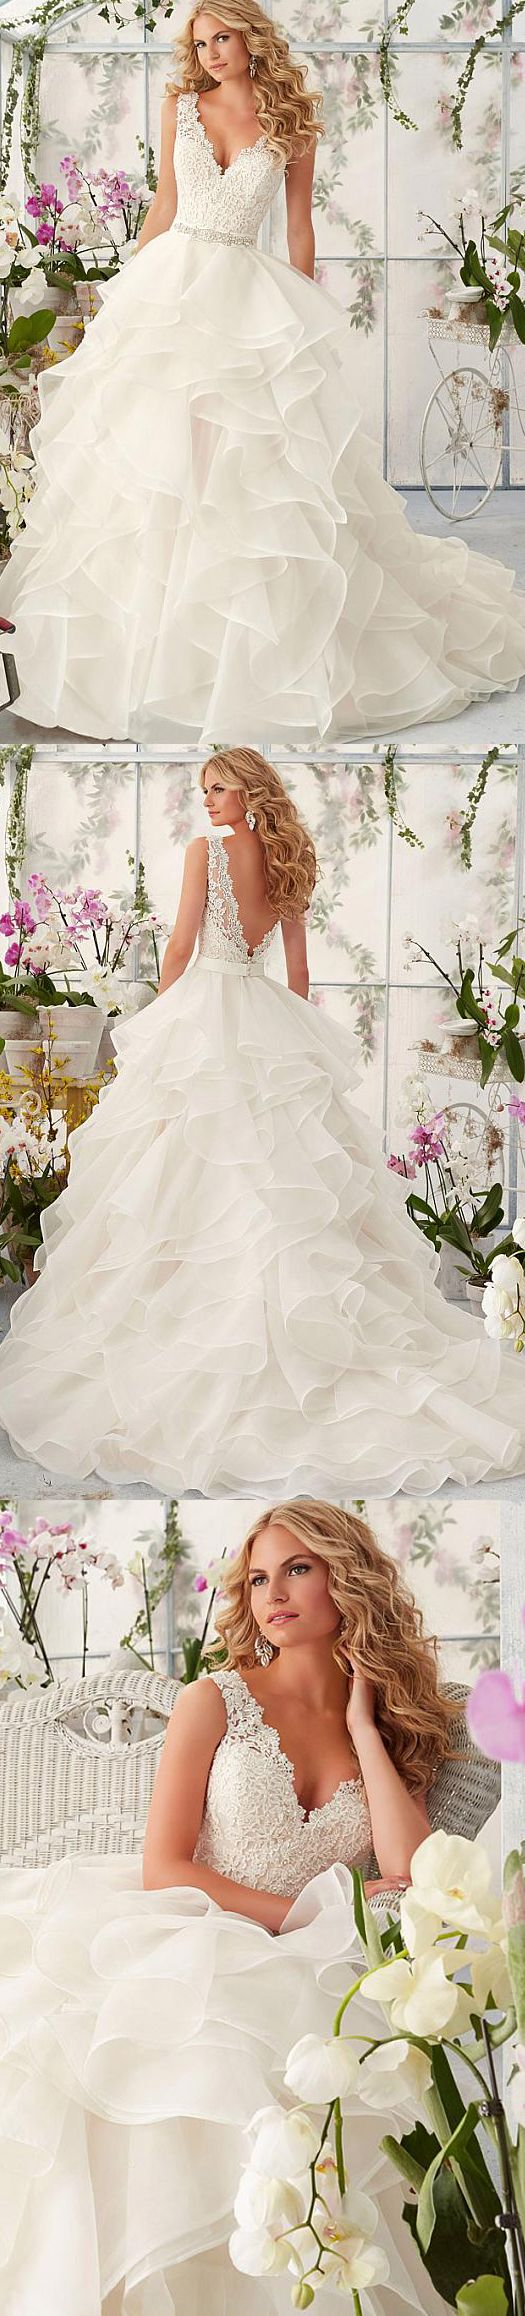 Elegant u romantic lace look wedding dresses gowns ideas that